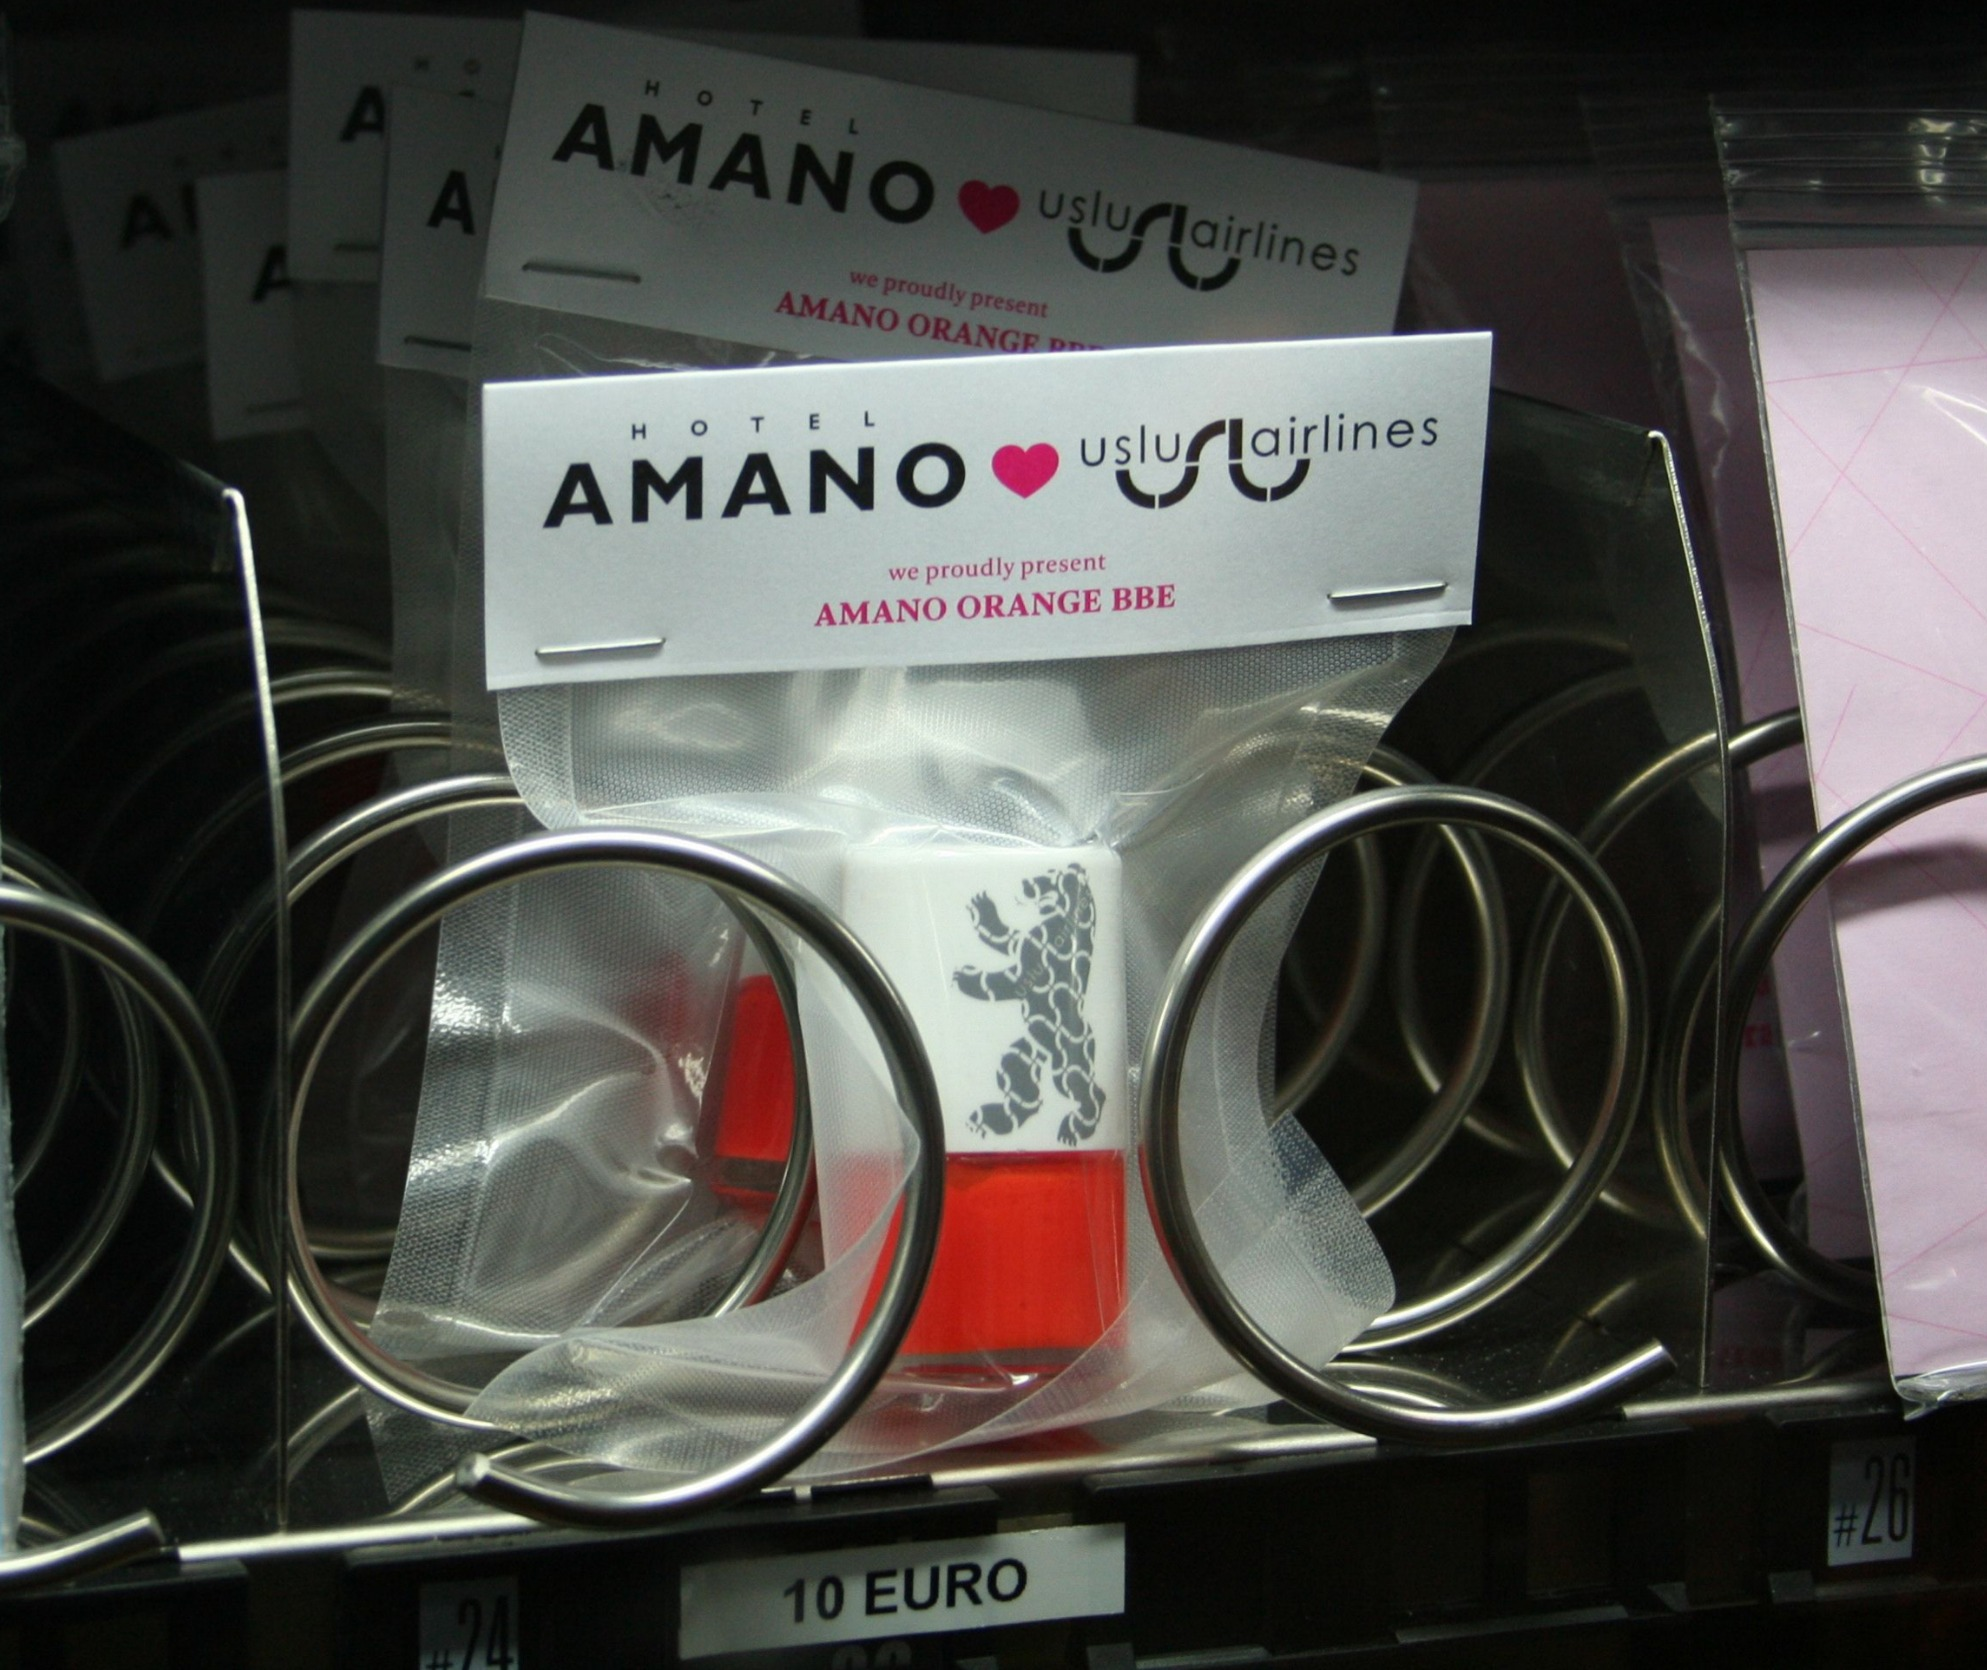 uslu airlines x AMANO Hotel